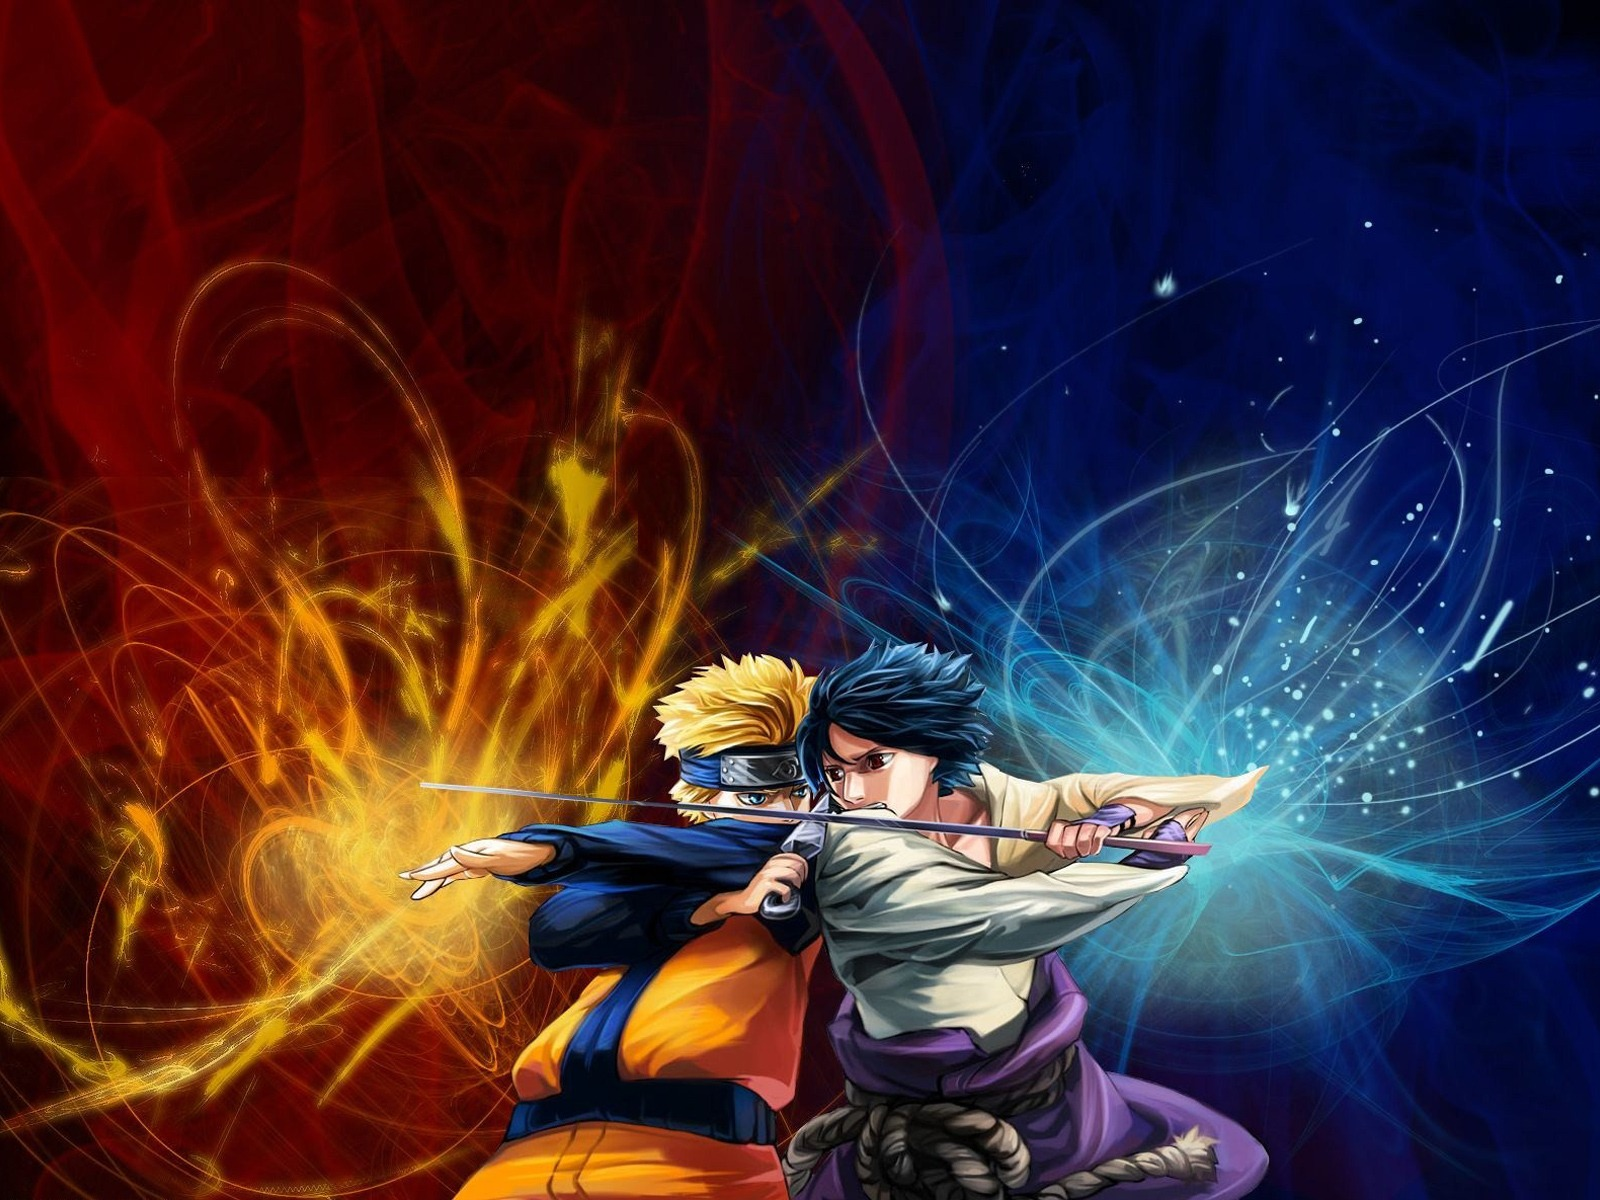 Download Wallpaper Naruto Blue - naruto_vs_sasuke_wallpaper_naruto_anime_animated_648  Photograph_895677.jpg